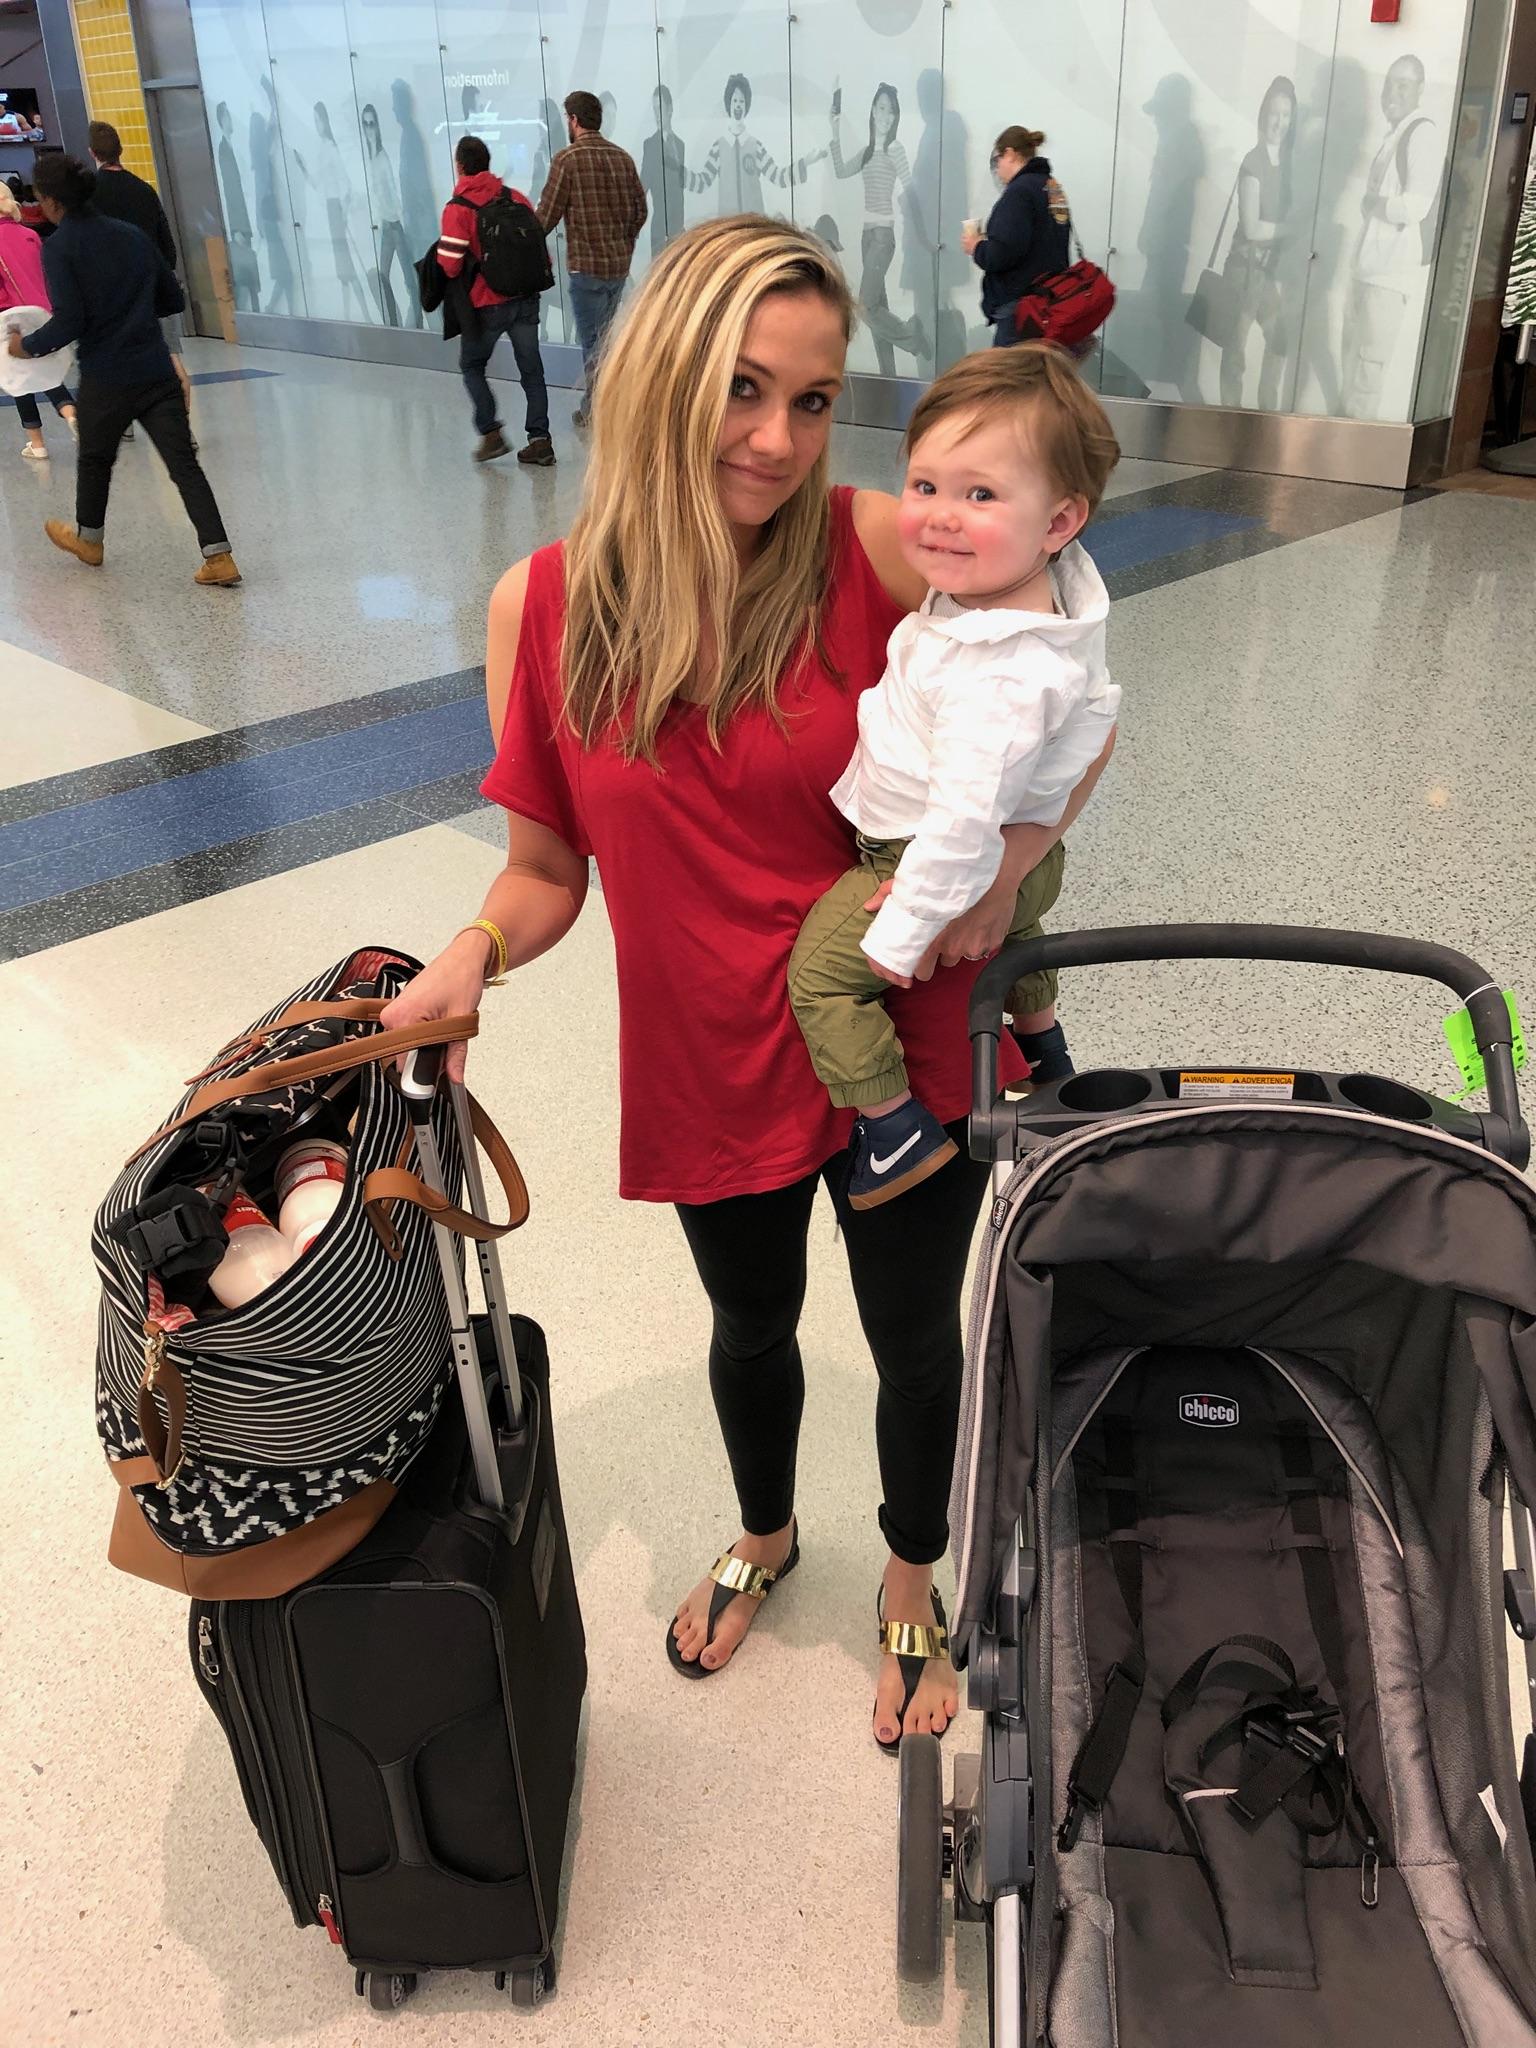 bringing-baby-on-airplane